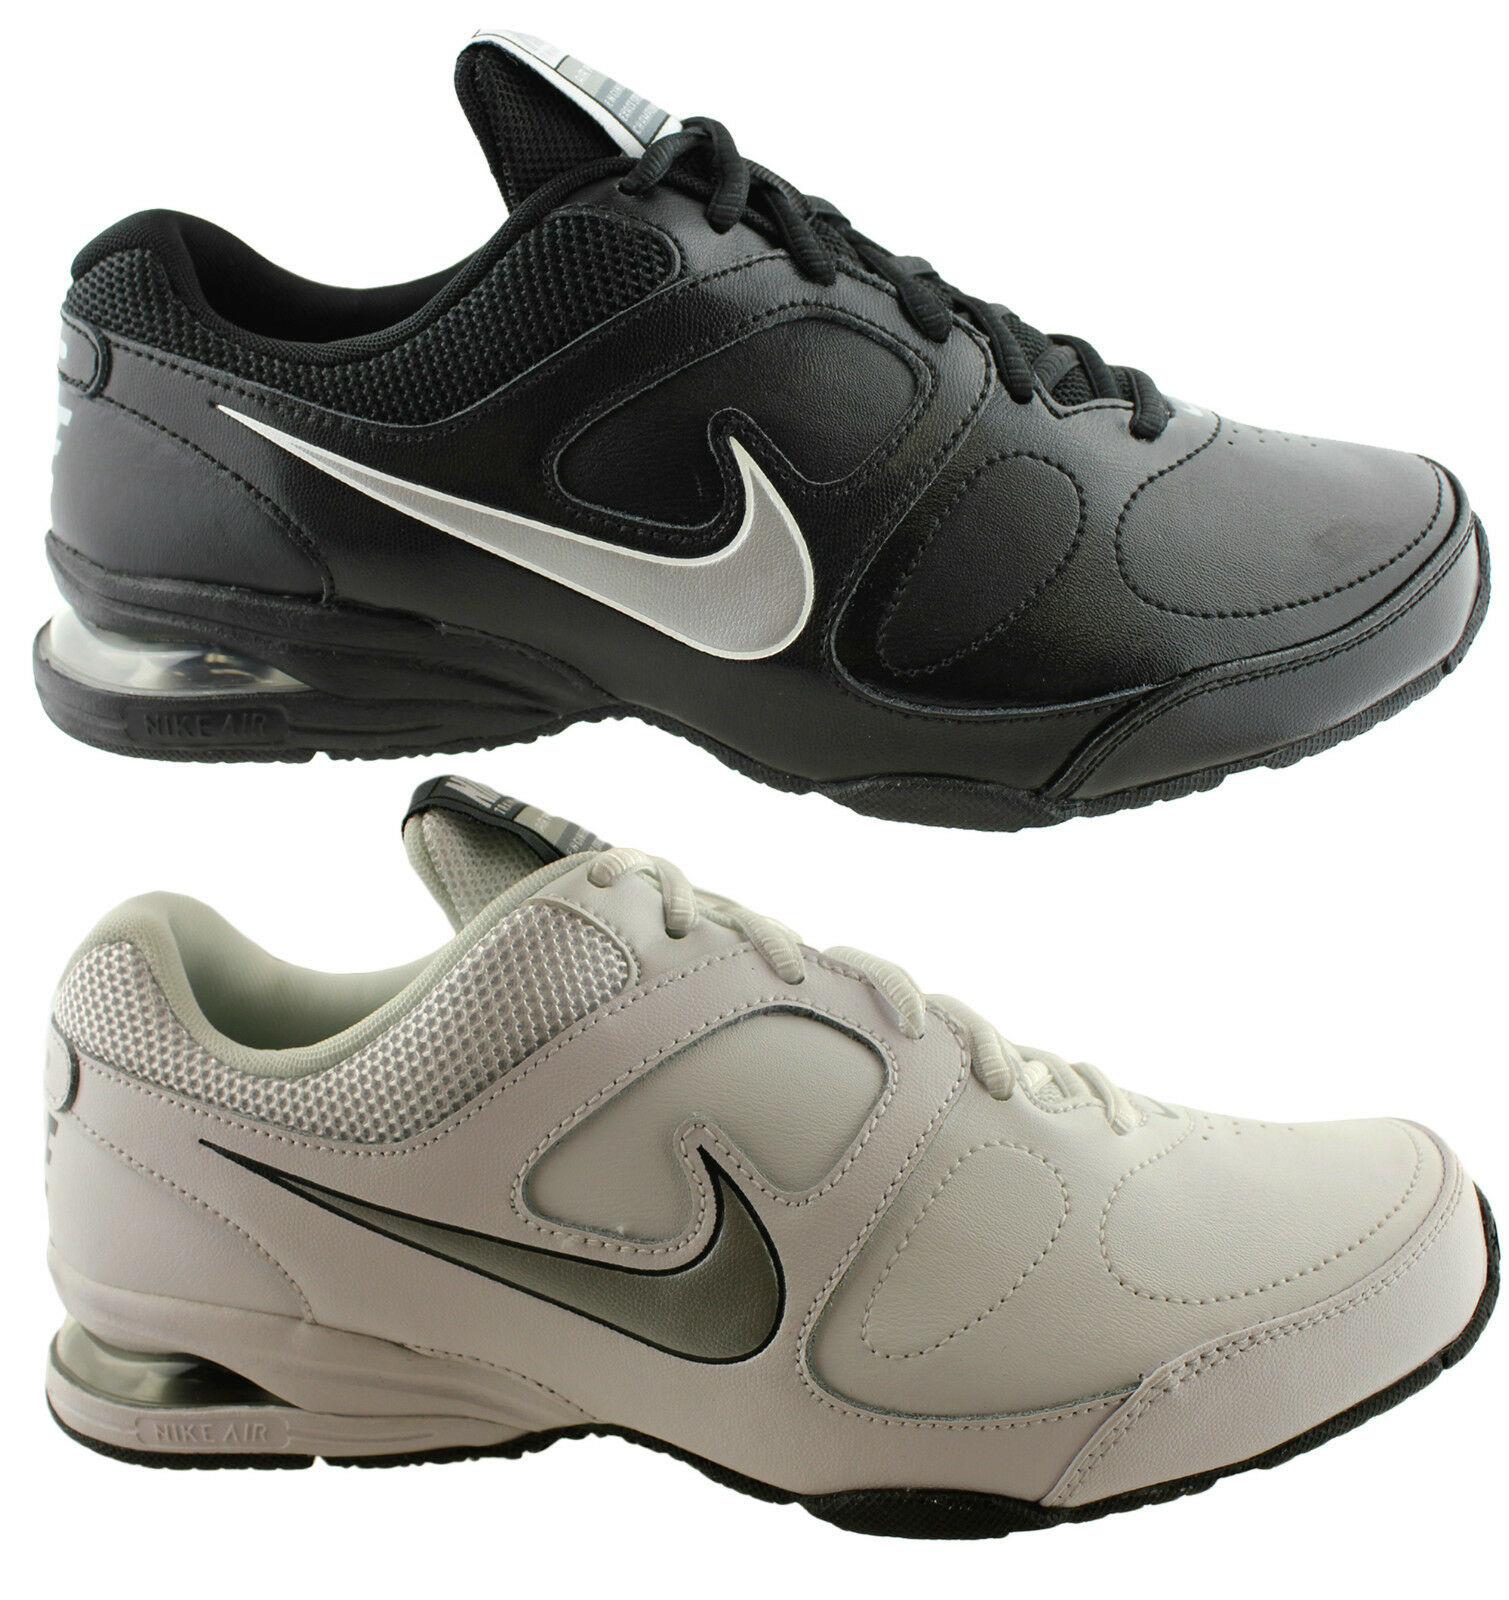 NIKE AIR PROPEL TR LEA Femme/LADIES chaussures/SNEAKERS/TRAINERS ON EBAY AUSTRALIA